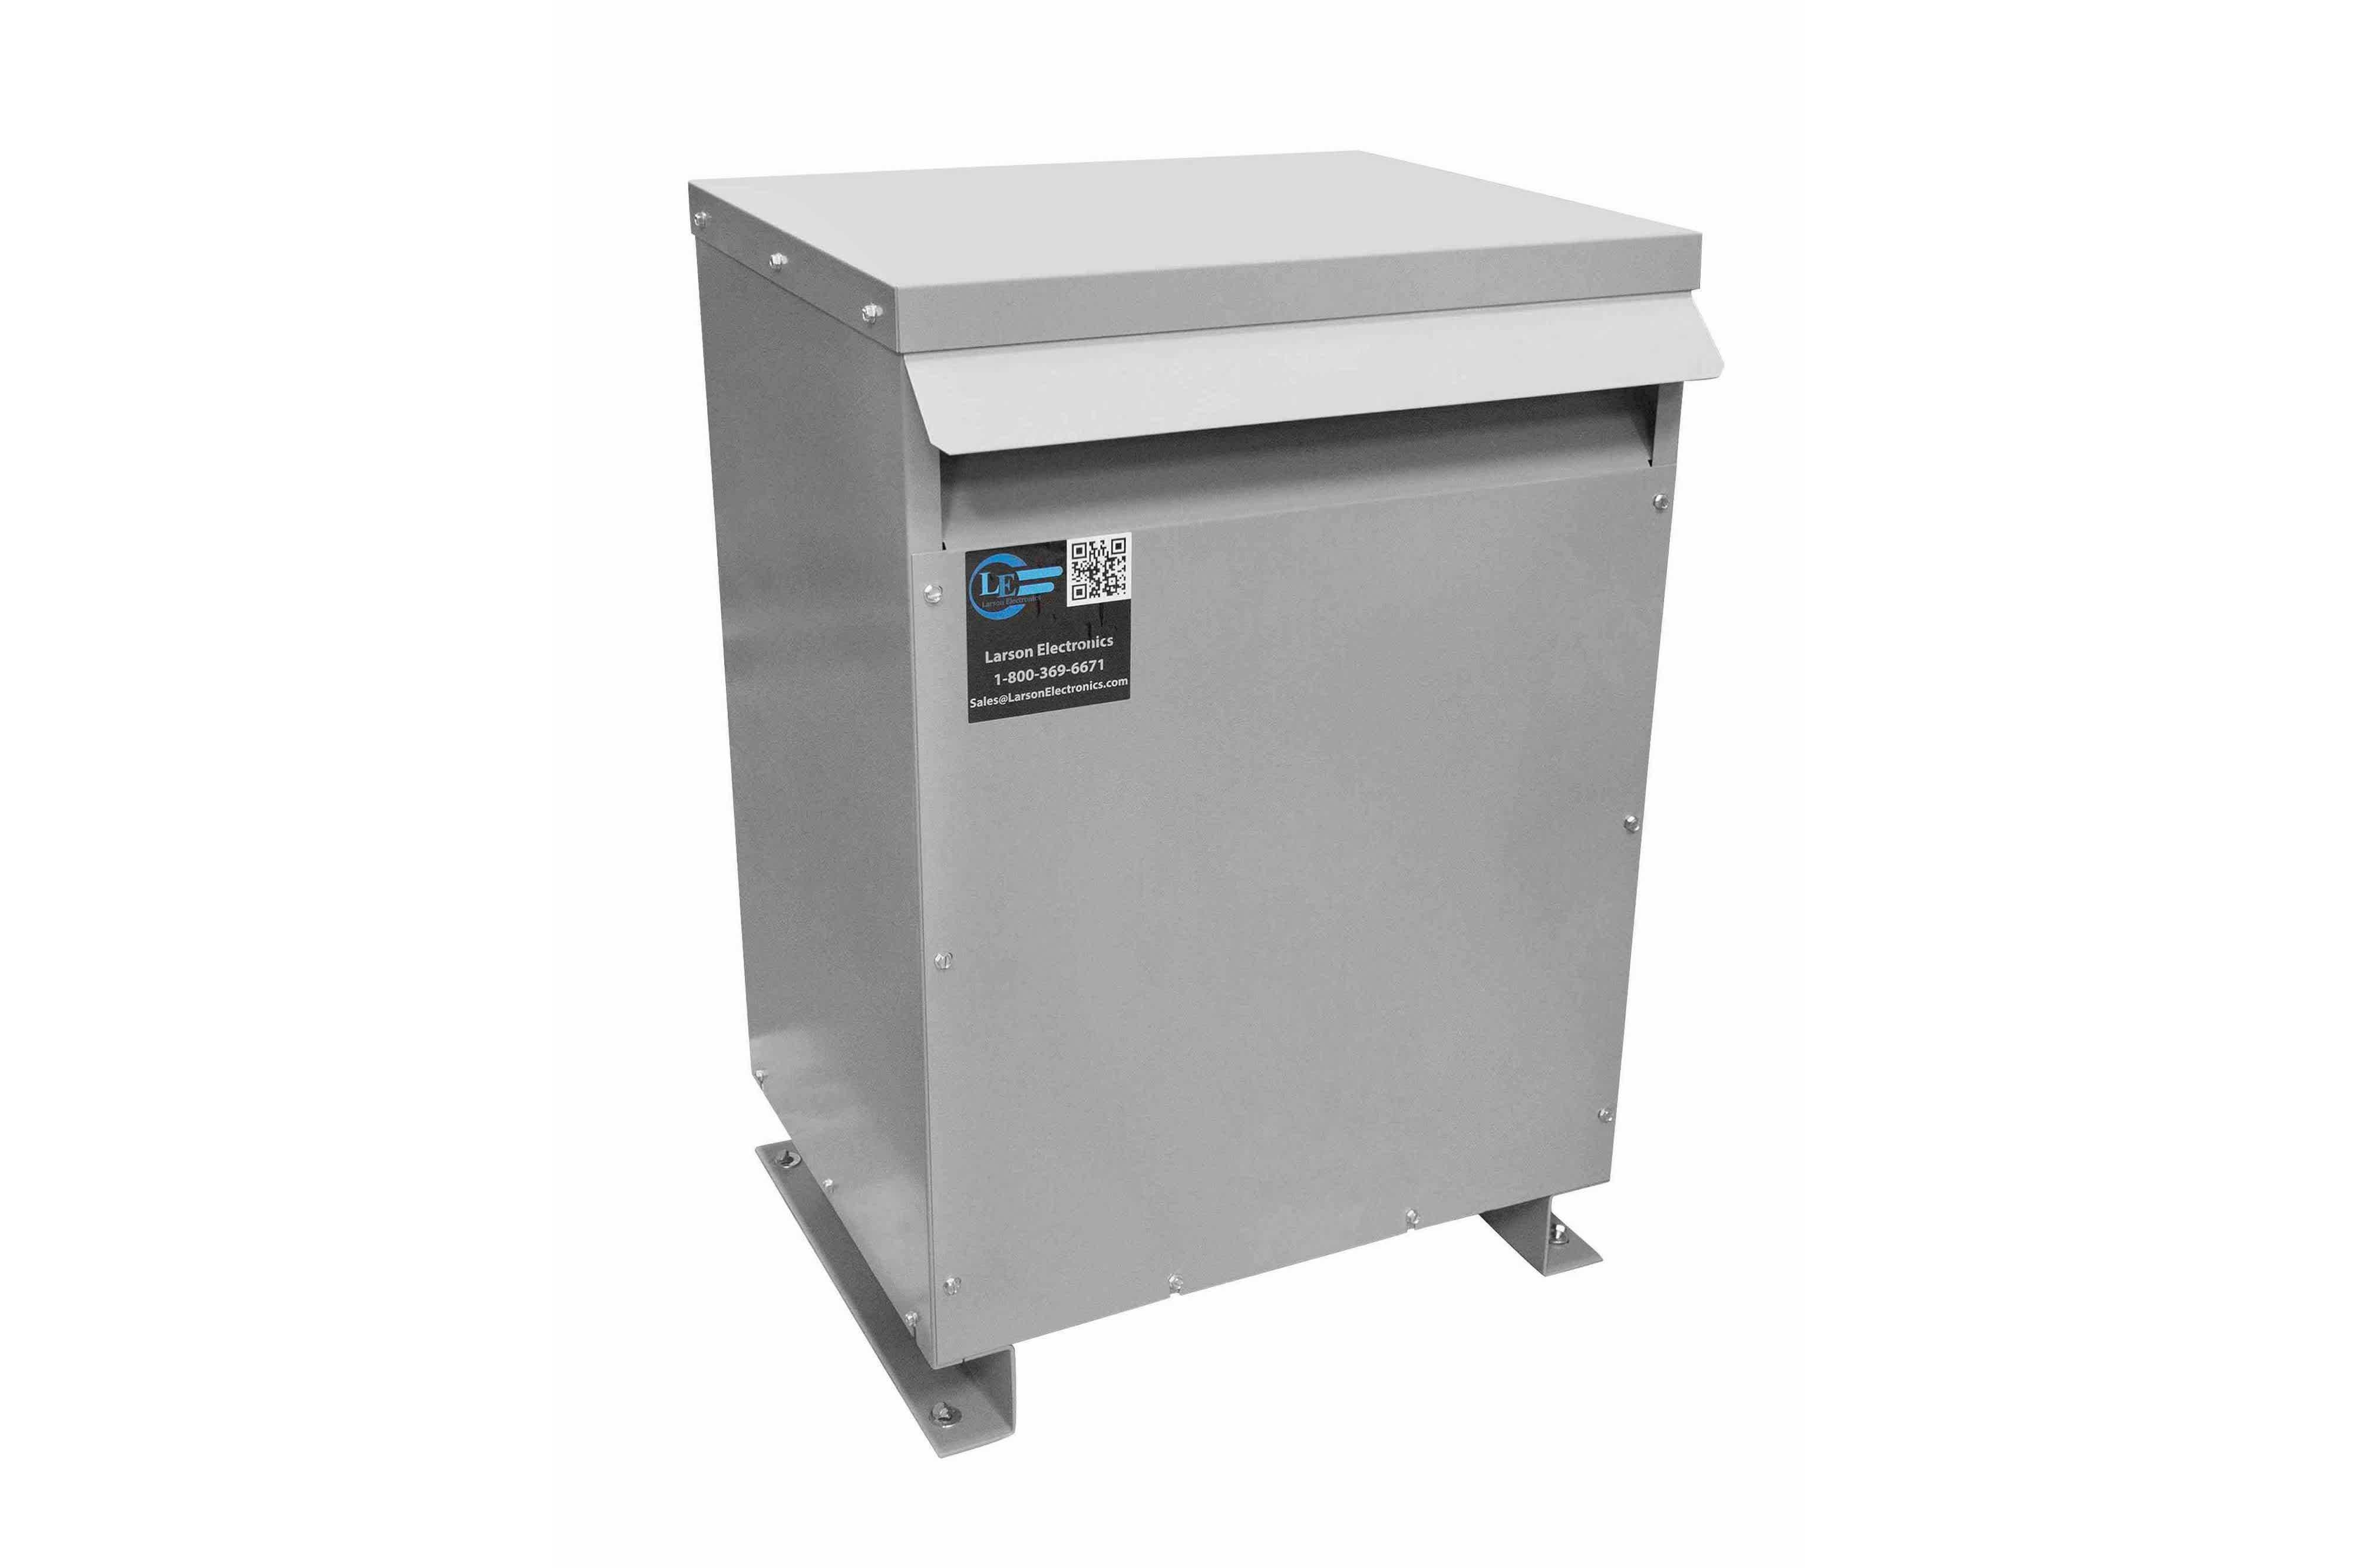 750 kVA 3PH Isolation Transformer, 575V Wye Primary, 208Y/120 Wye-N Secondary, N3R, Ventilated, 60 Hz